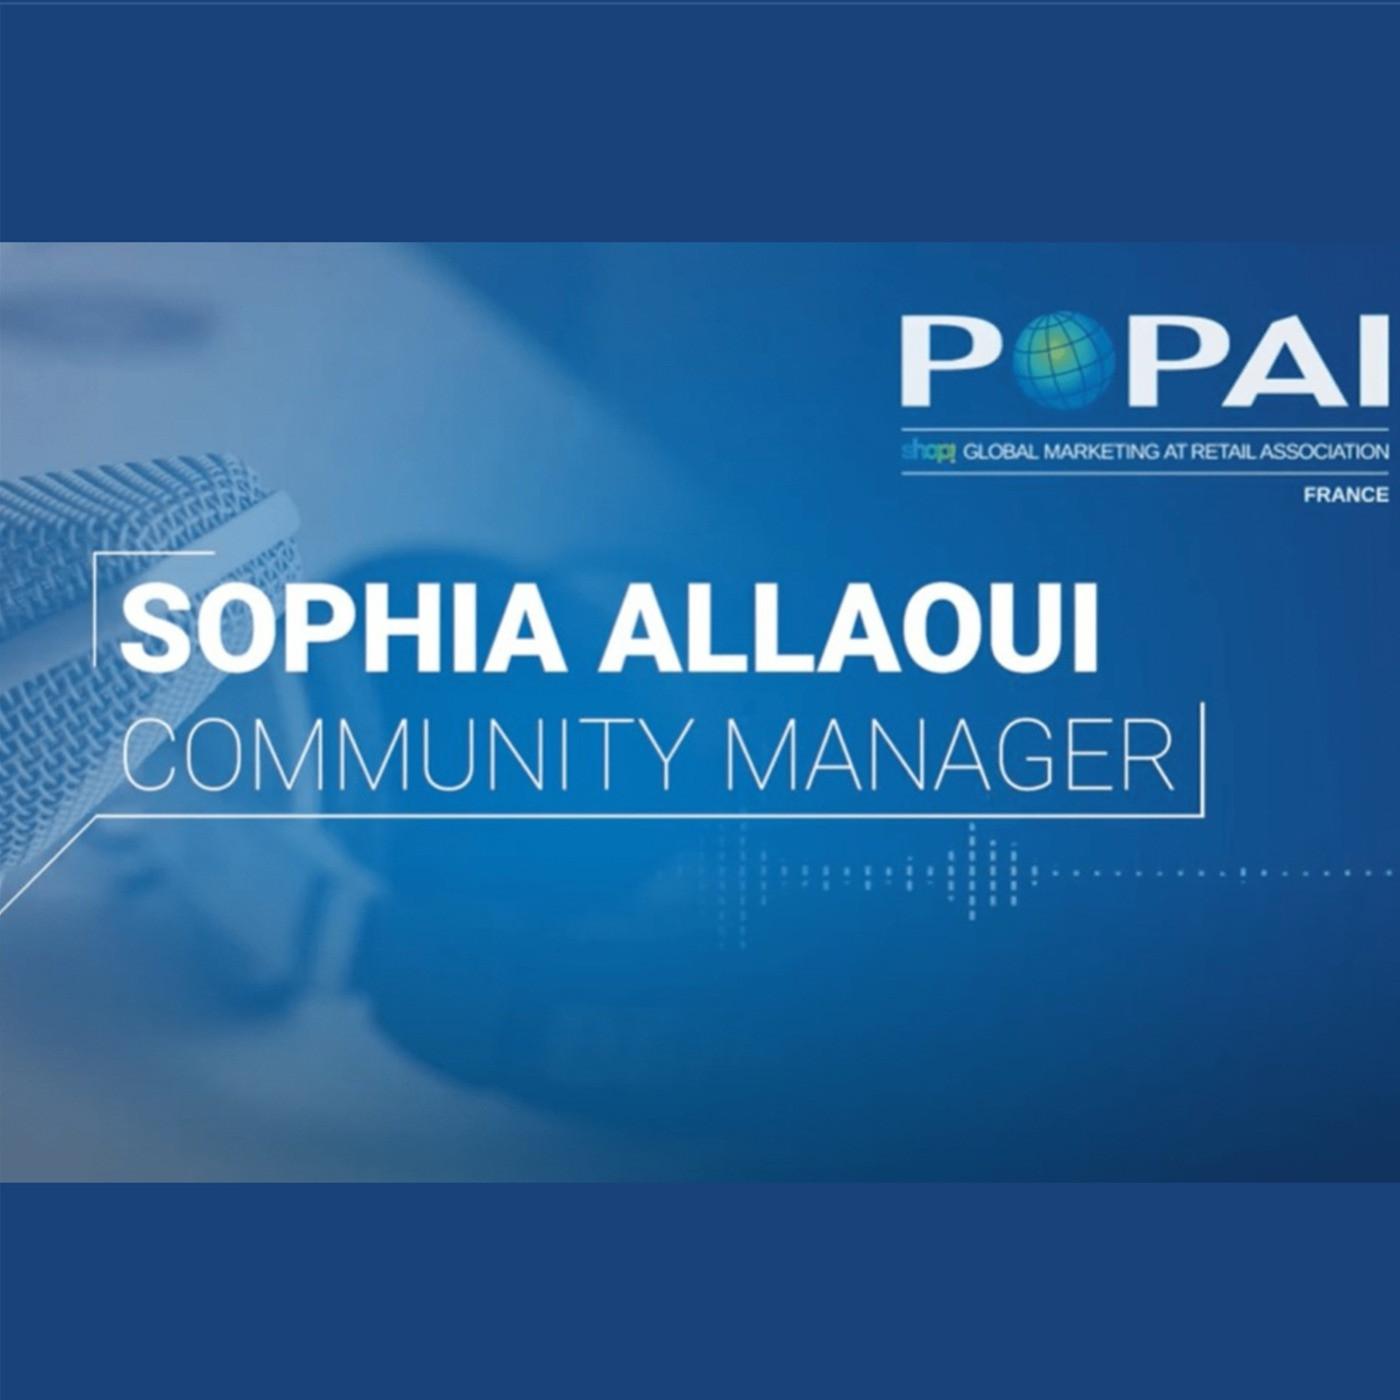 Interview Sophia ALLAOUI - Community manager SQUARE SOLUTIONS PARIS